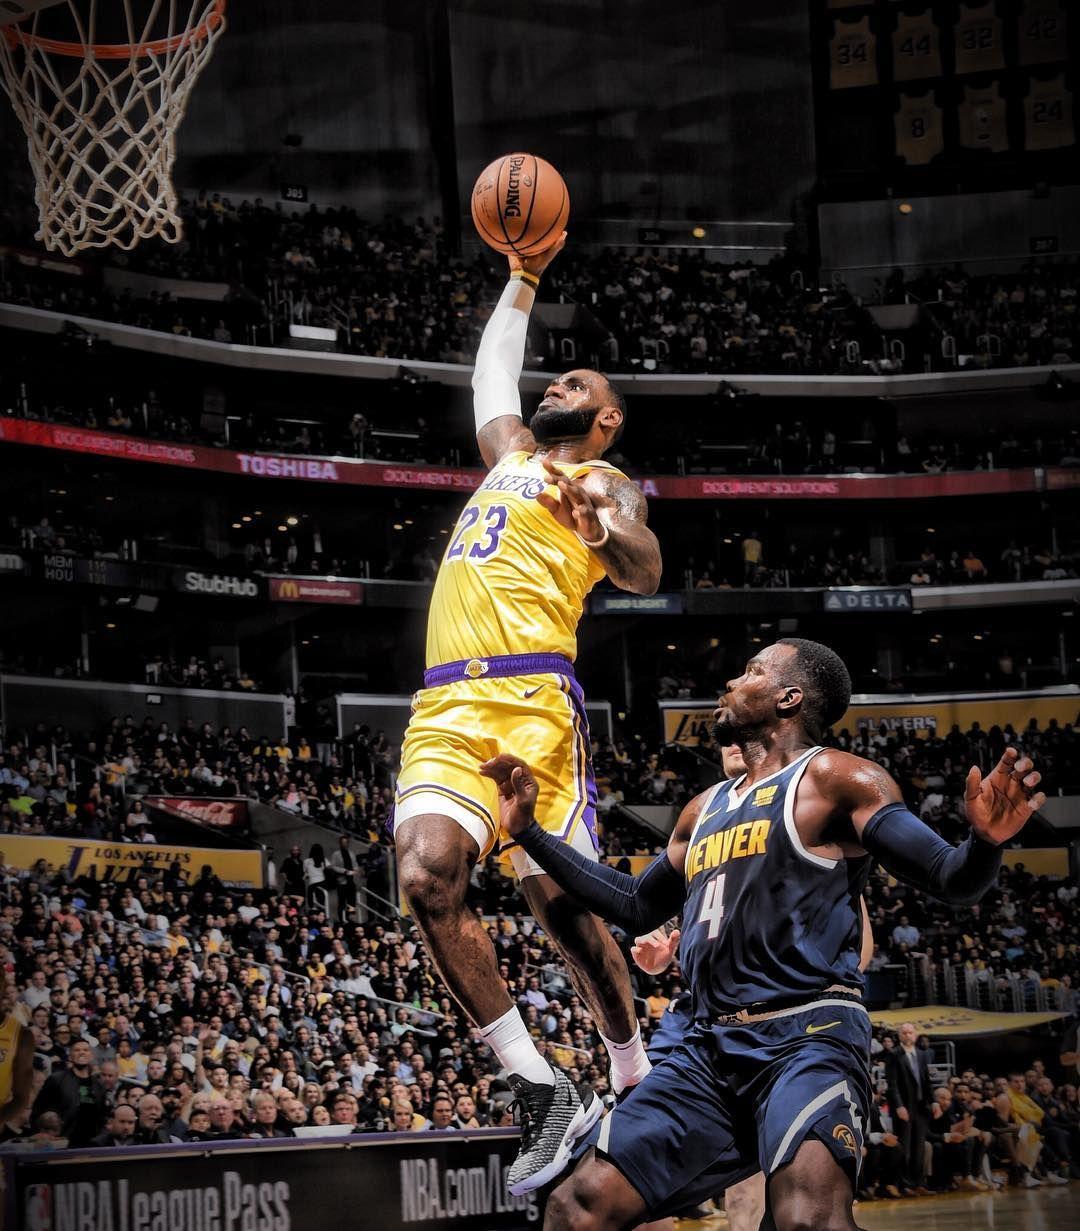 "NBA 在 Instagram 上发布:""👑💥 NBAPreseason"" Lebron james, Nba"